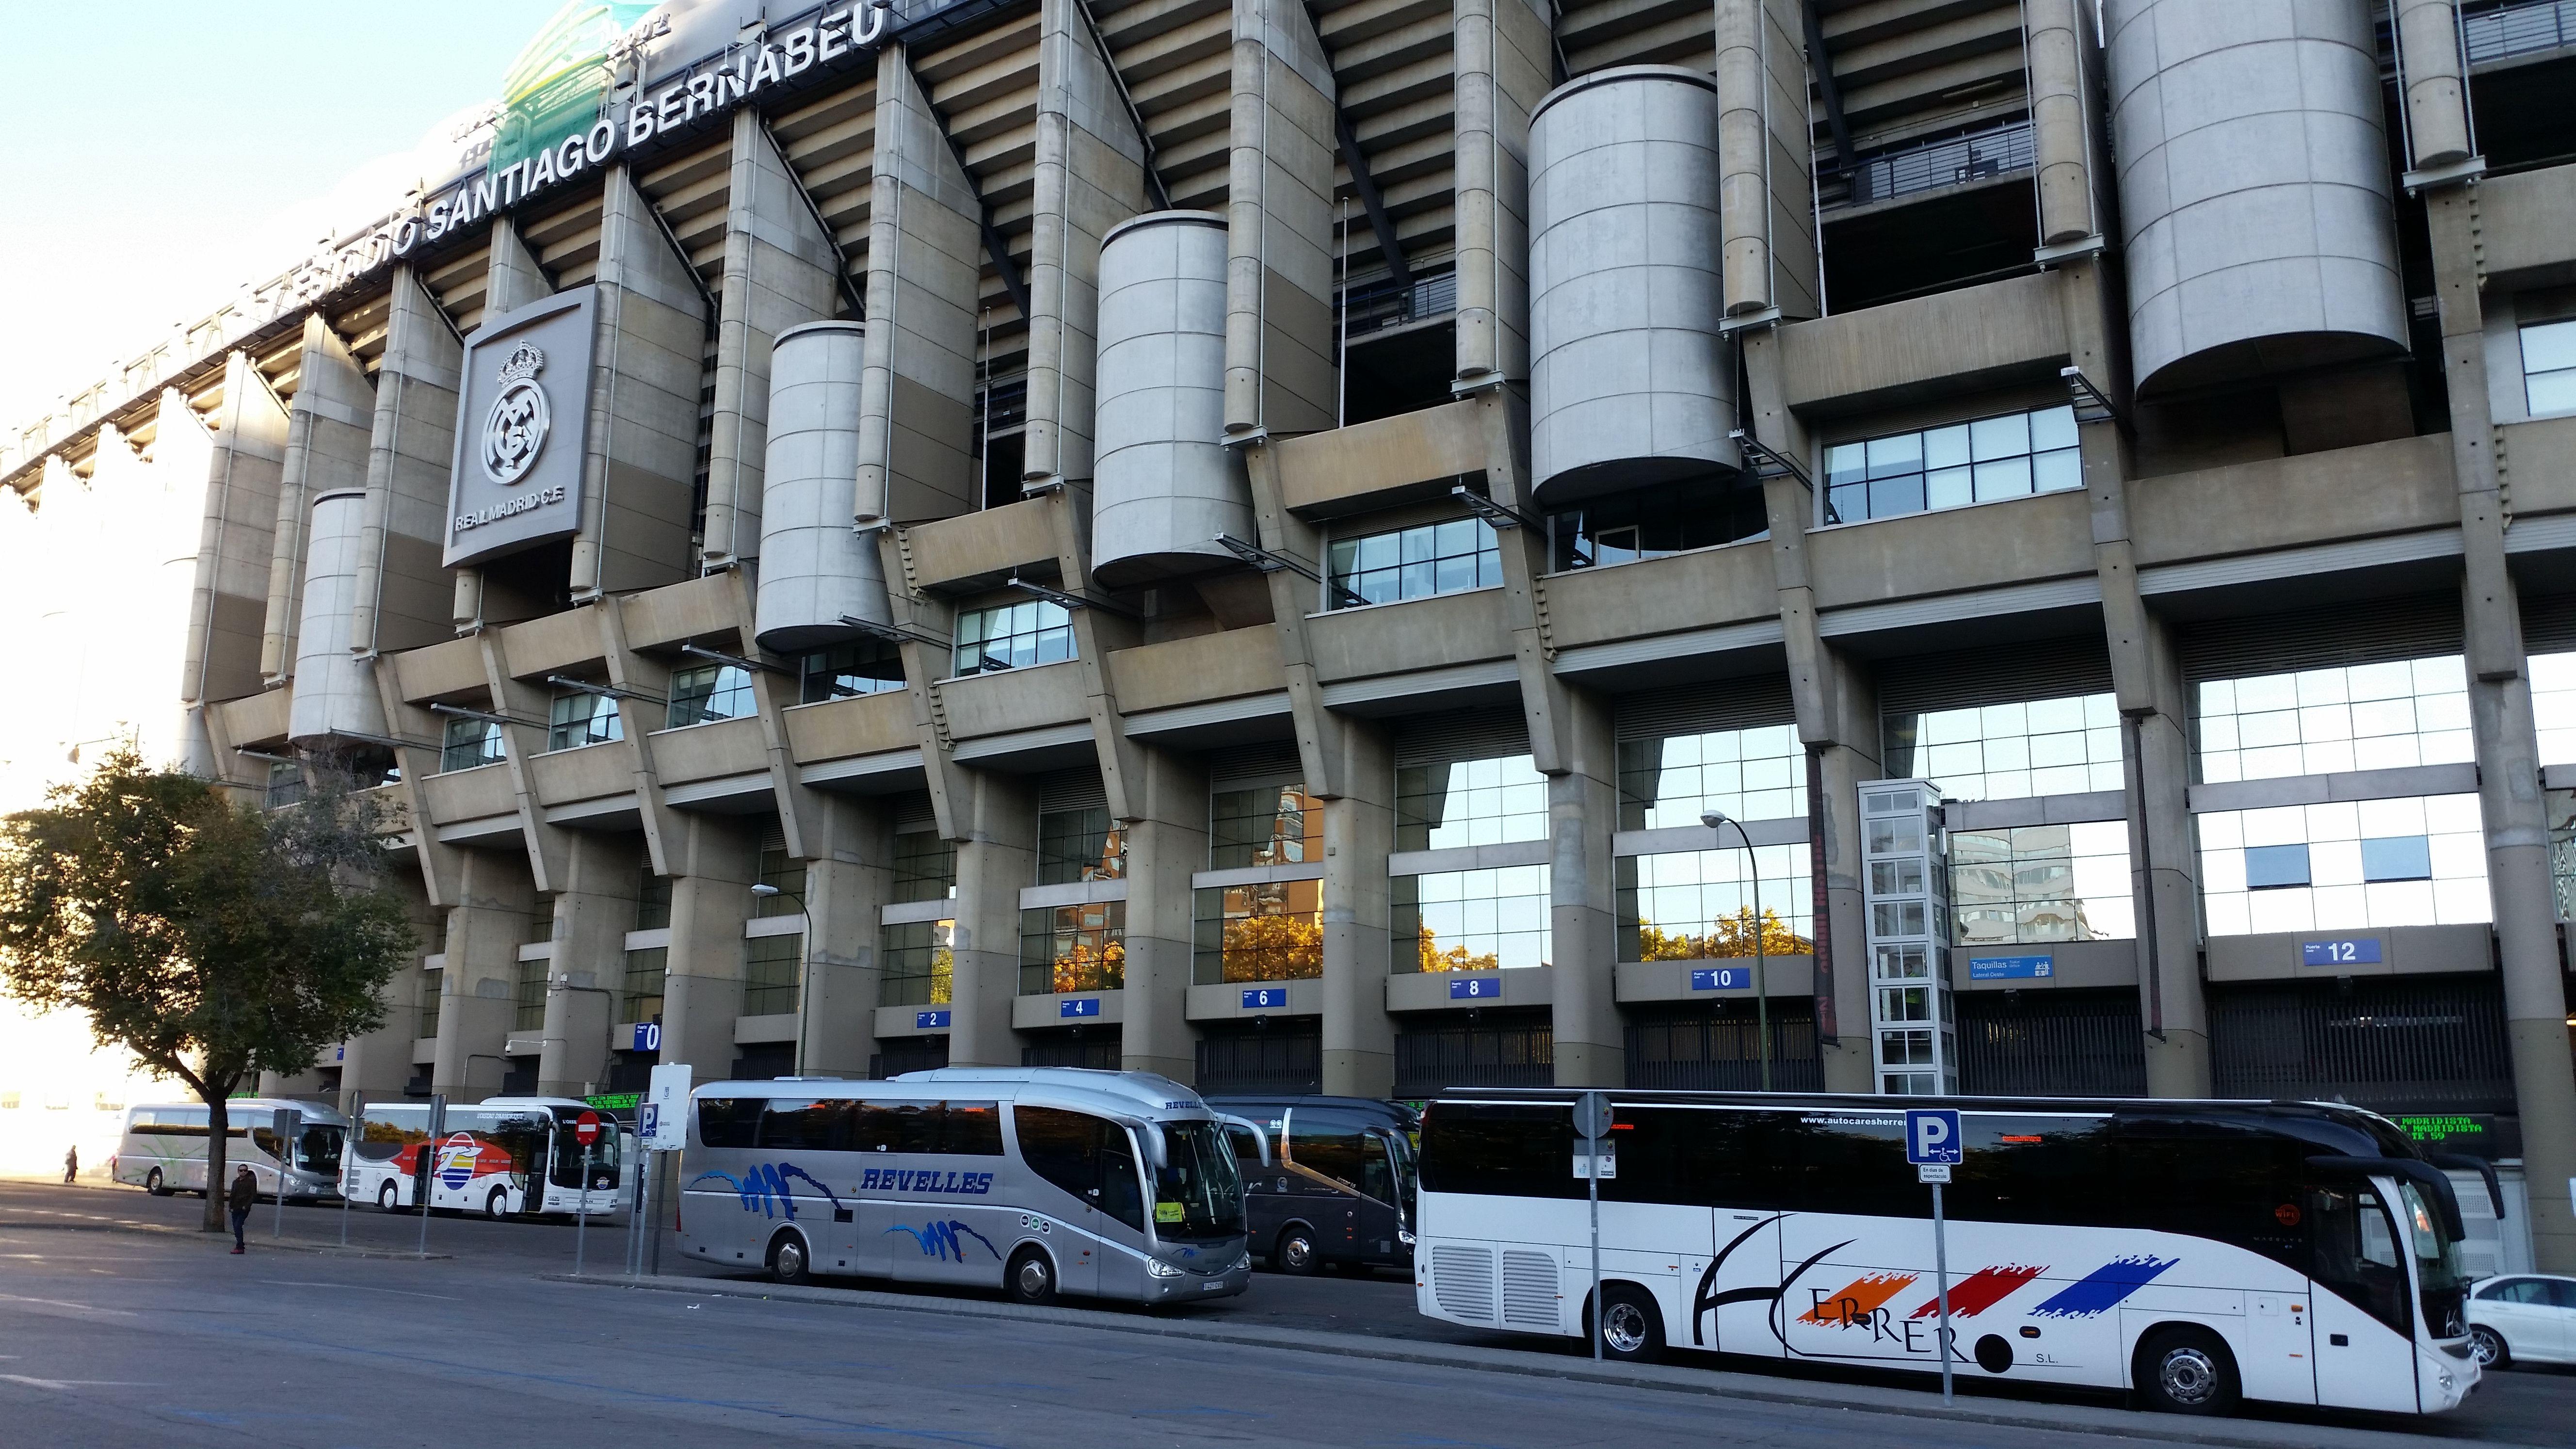 Alquiler de autocares en Palencia eventos deportivos, equipos de fútbol